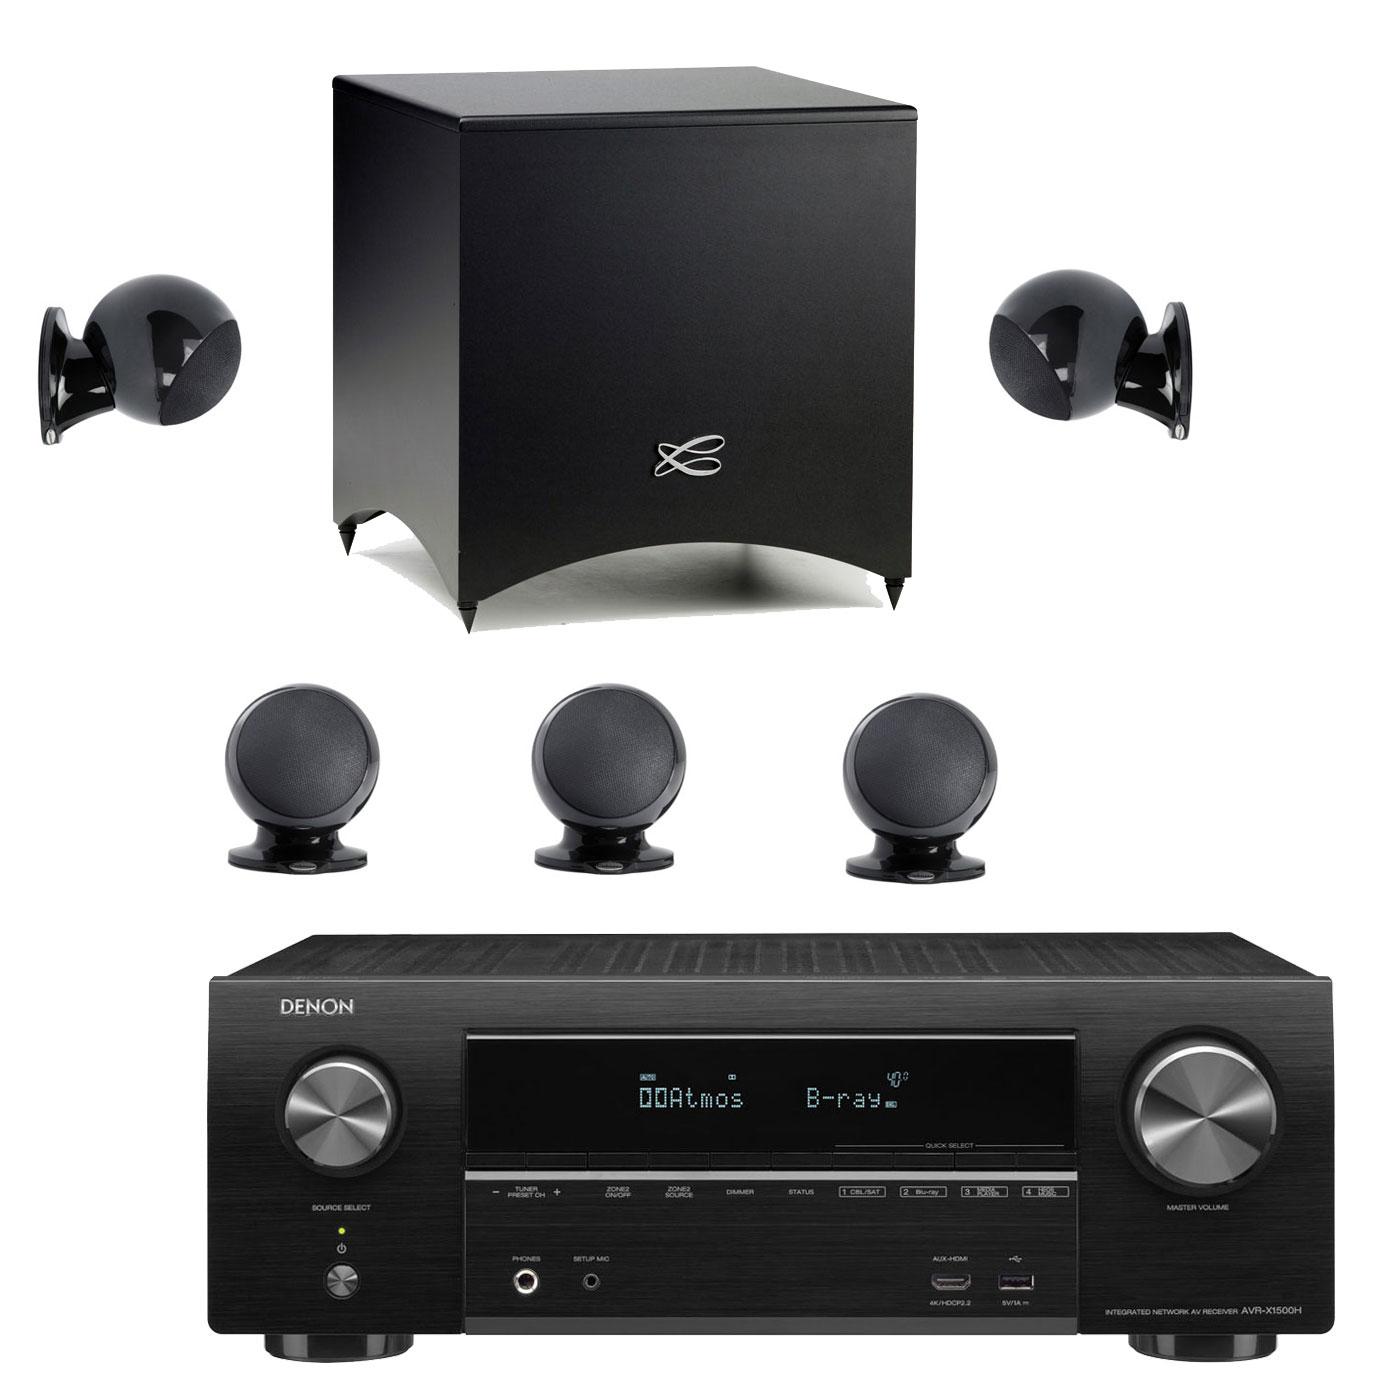 Ensemble home cinéma Denon AVR-X1500H Noir + Cabasse Alcyone 2 Pack 5.1 Noir Ampli-tuner Home Cinema 3D Ready 7.2 - Dolby Atmos / DTS:X - 6x HDMI 4K Ultra HD, HDCP 2.2, HDR - Wi-Fi, Bluetooth, AirPlay 2 - Multiroom - Amazon Alexa + Pack d'enceintes 5.1